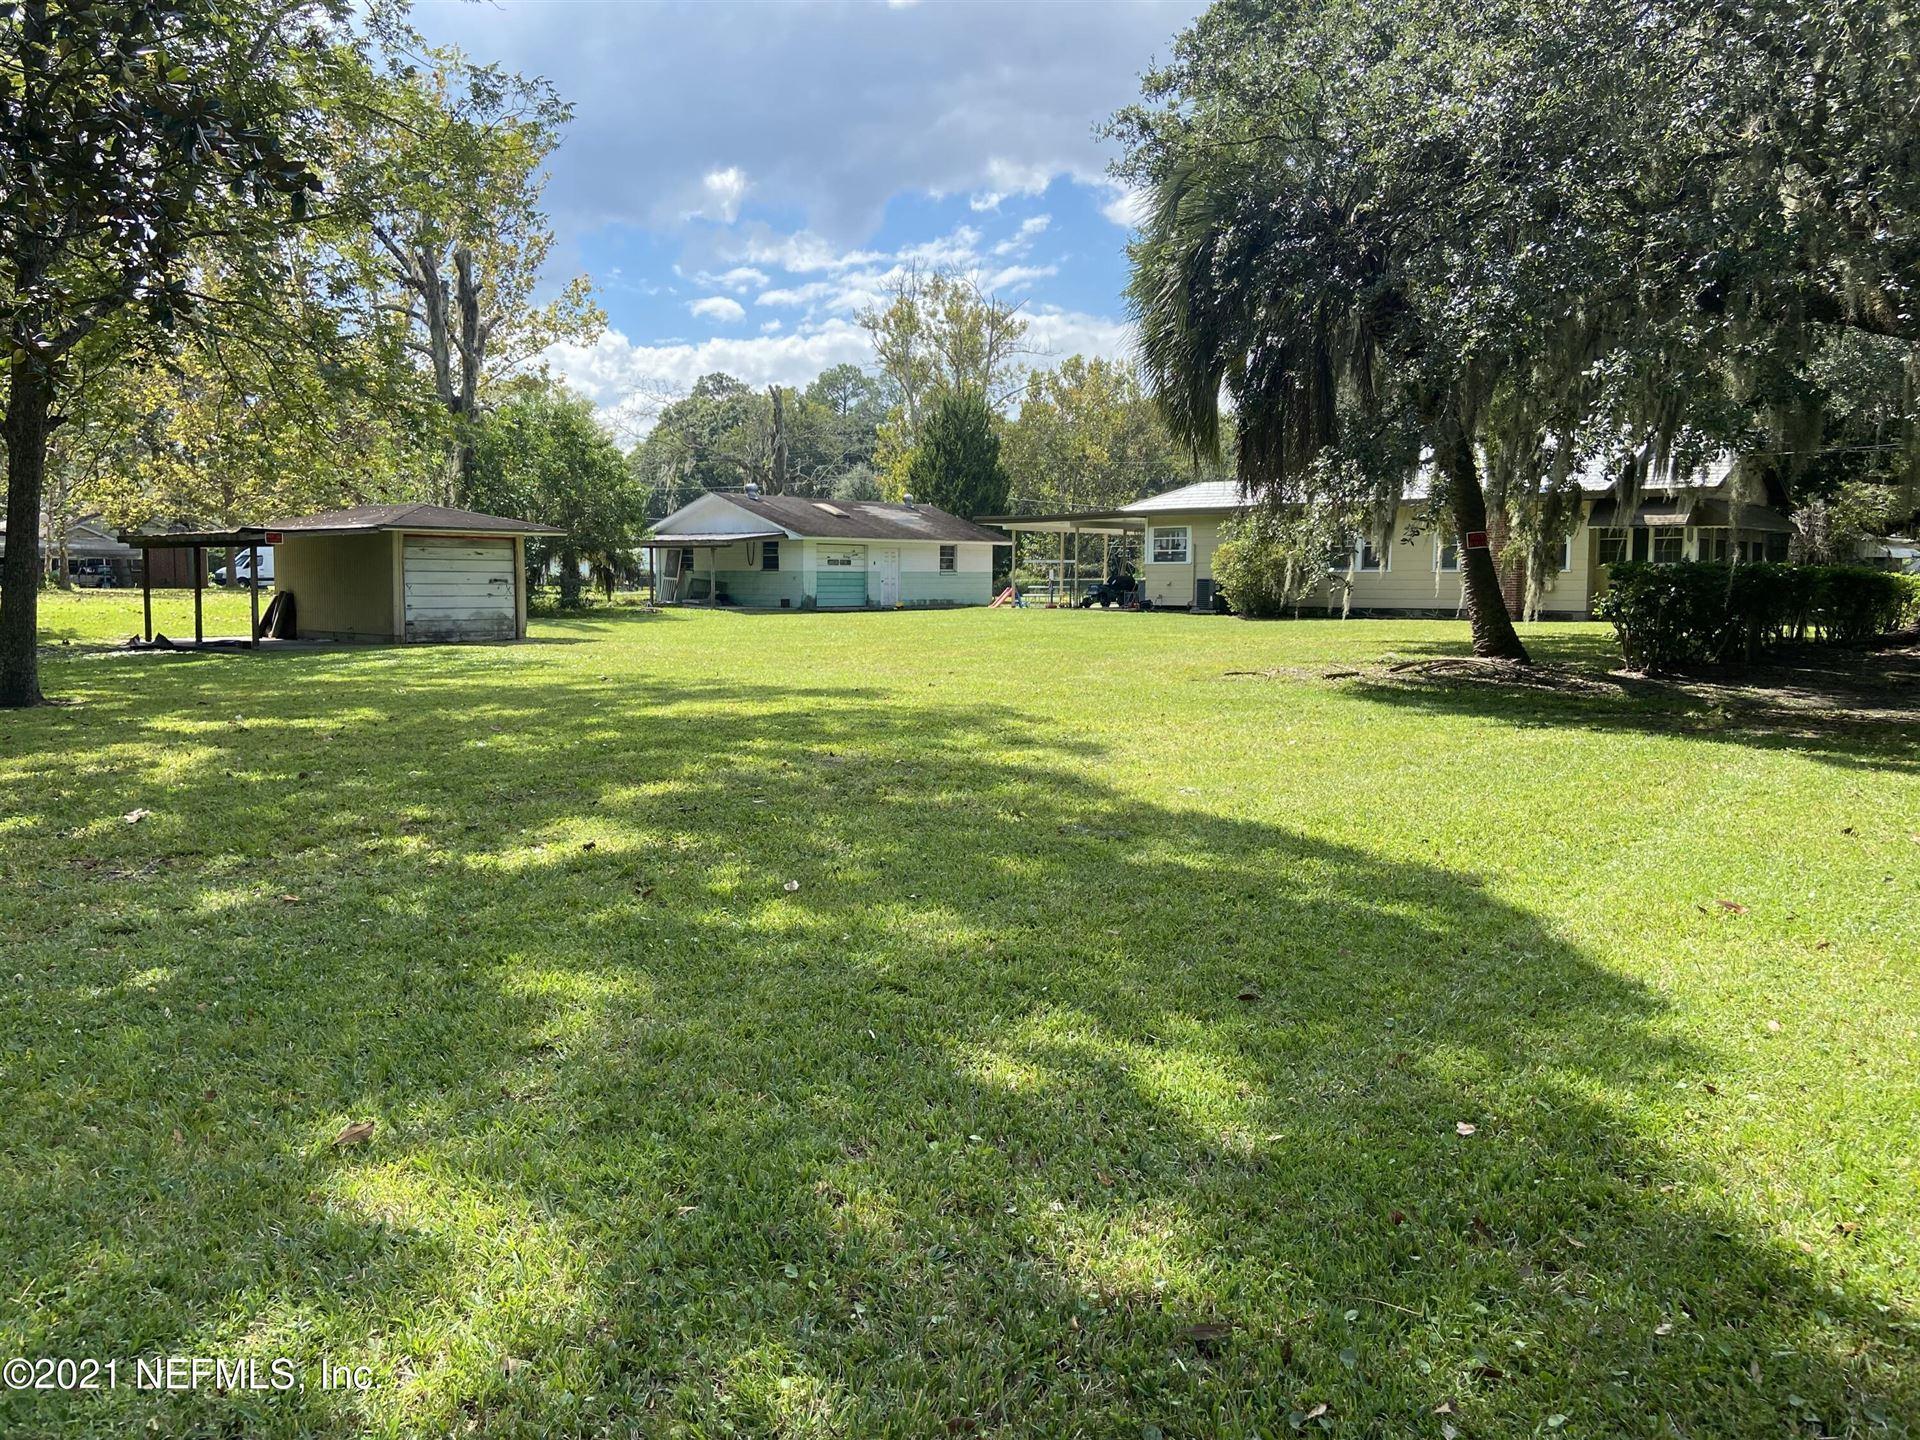 Photo of 0 KINGSBURY ST #Lot No: E 70FT OF W, JACKSONVILLE, FL 32205 (MLS # 1136867)